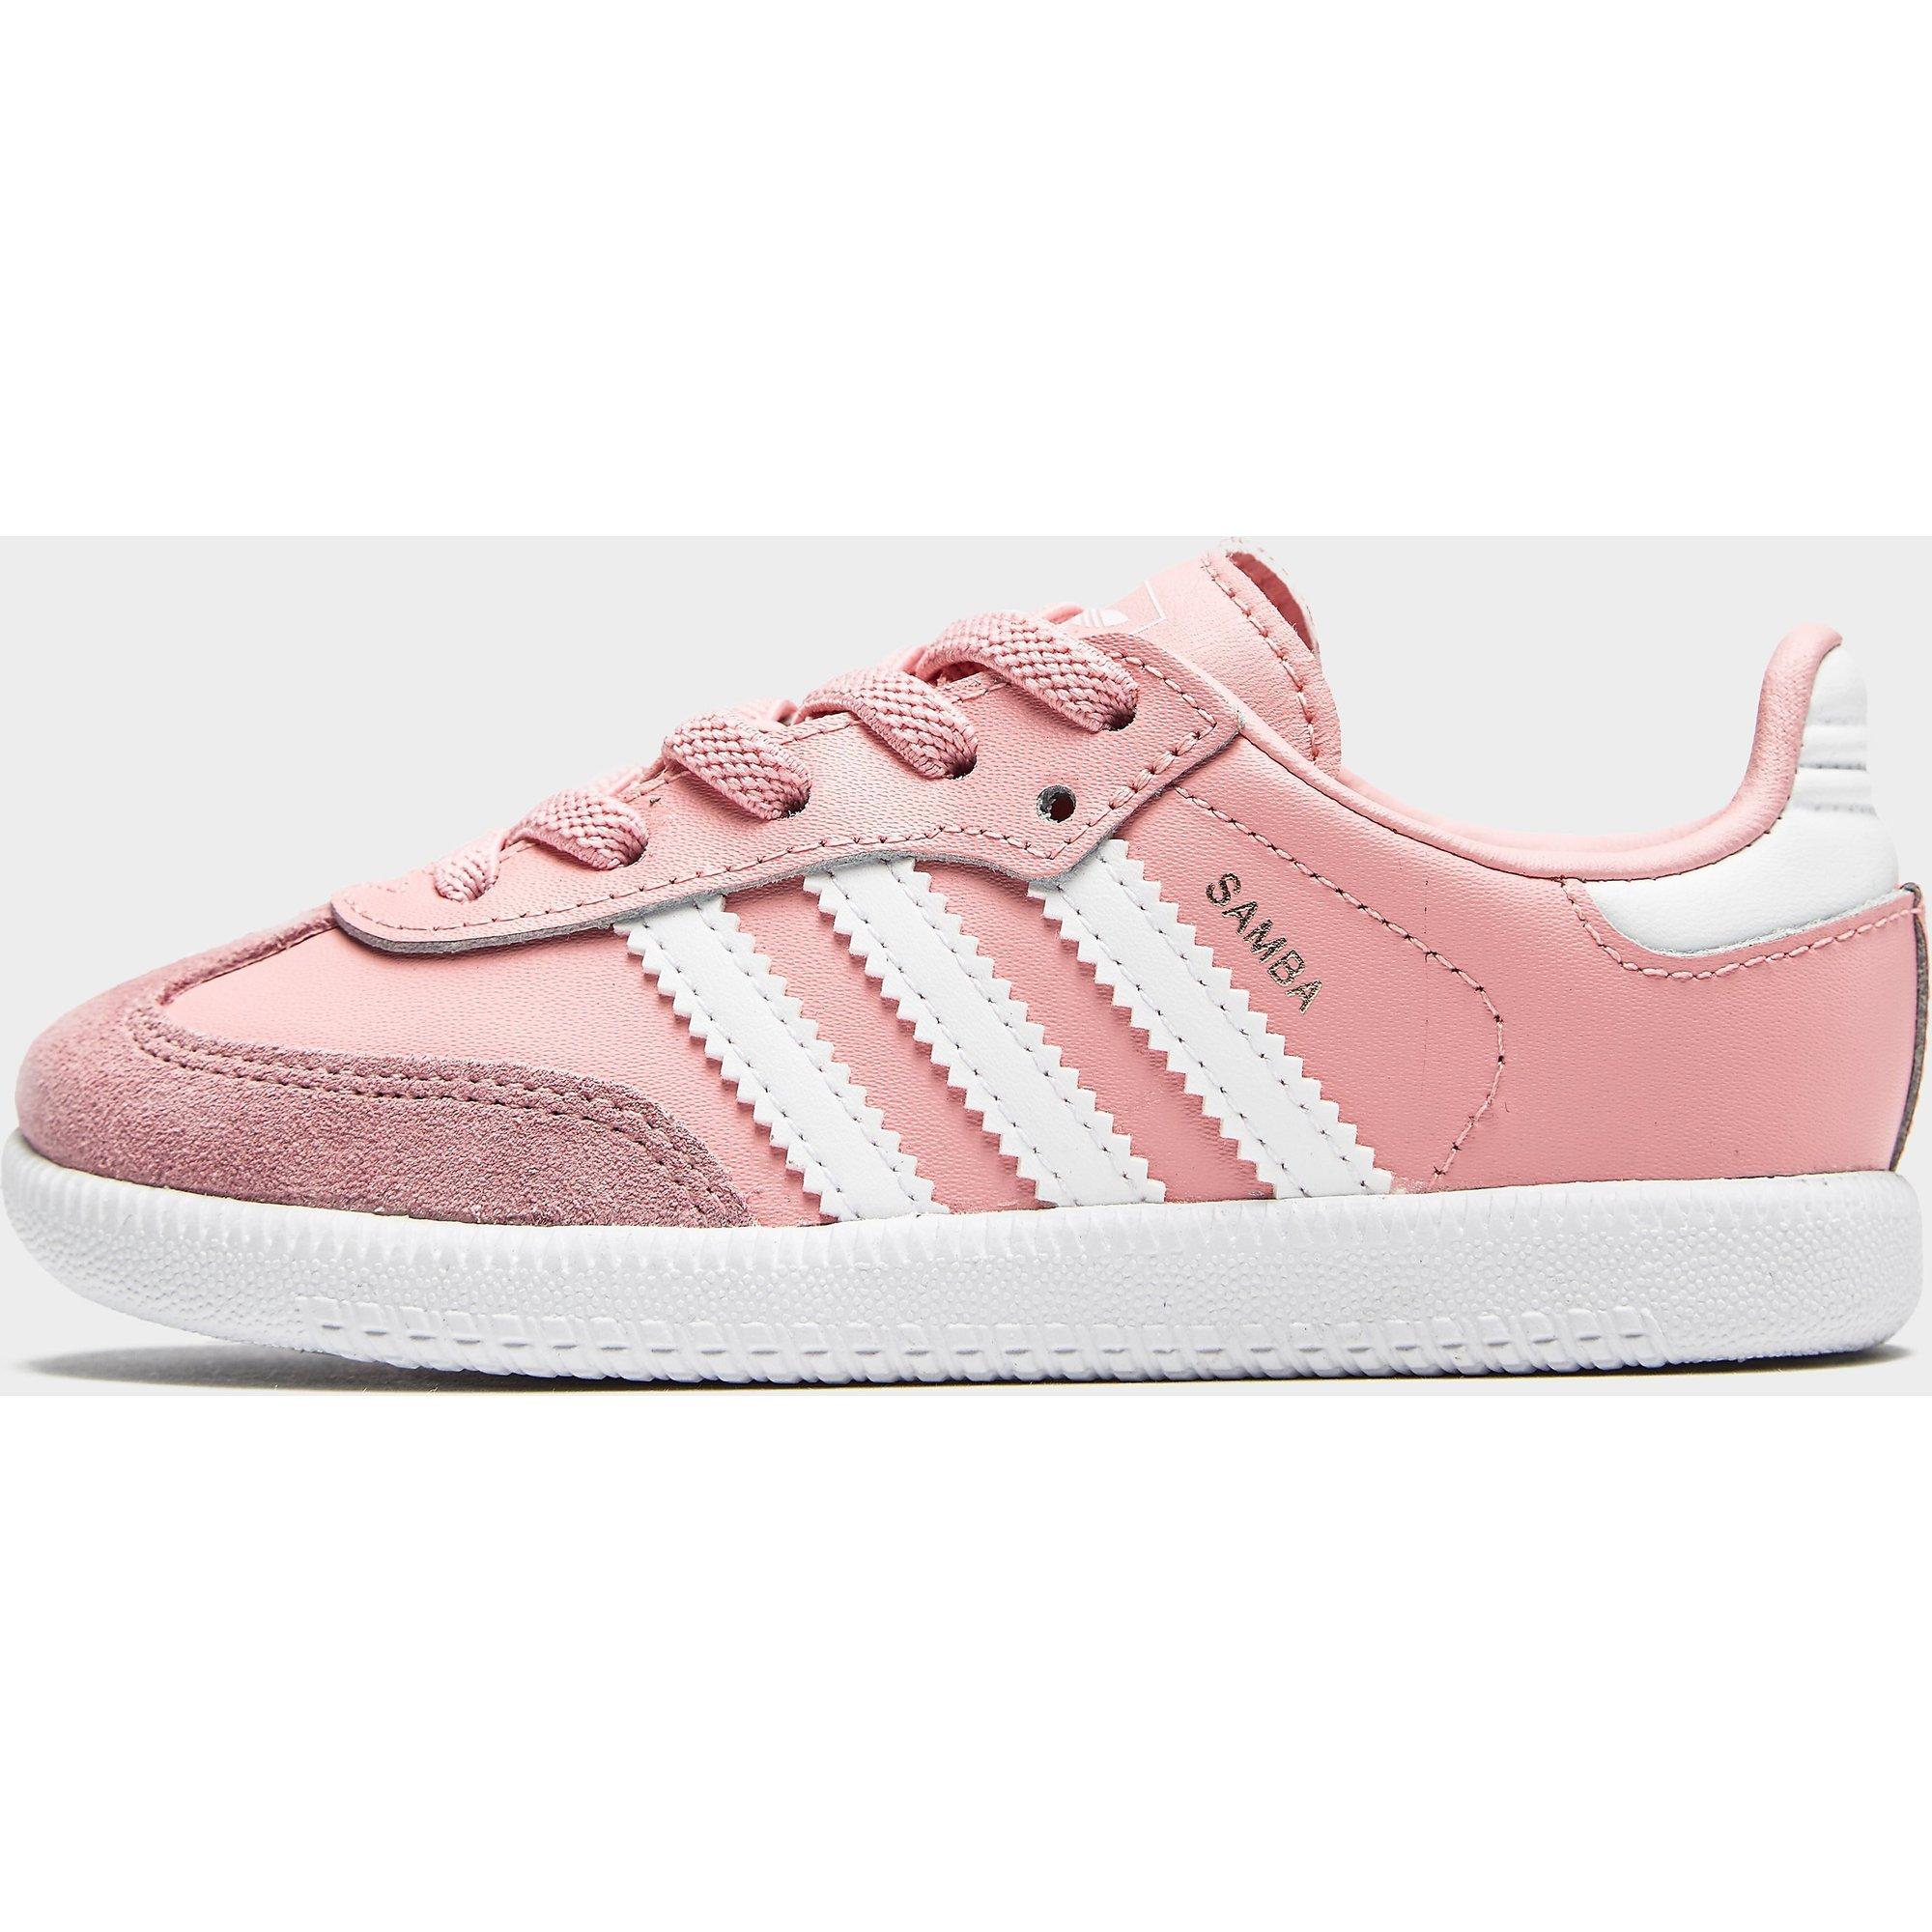 Skechers Sneakers 433-15-15 wit